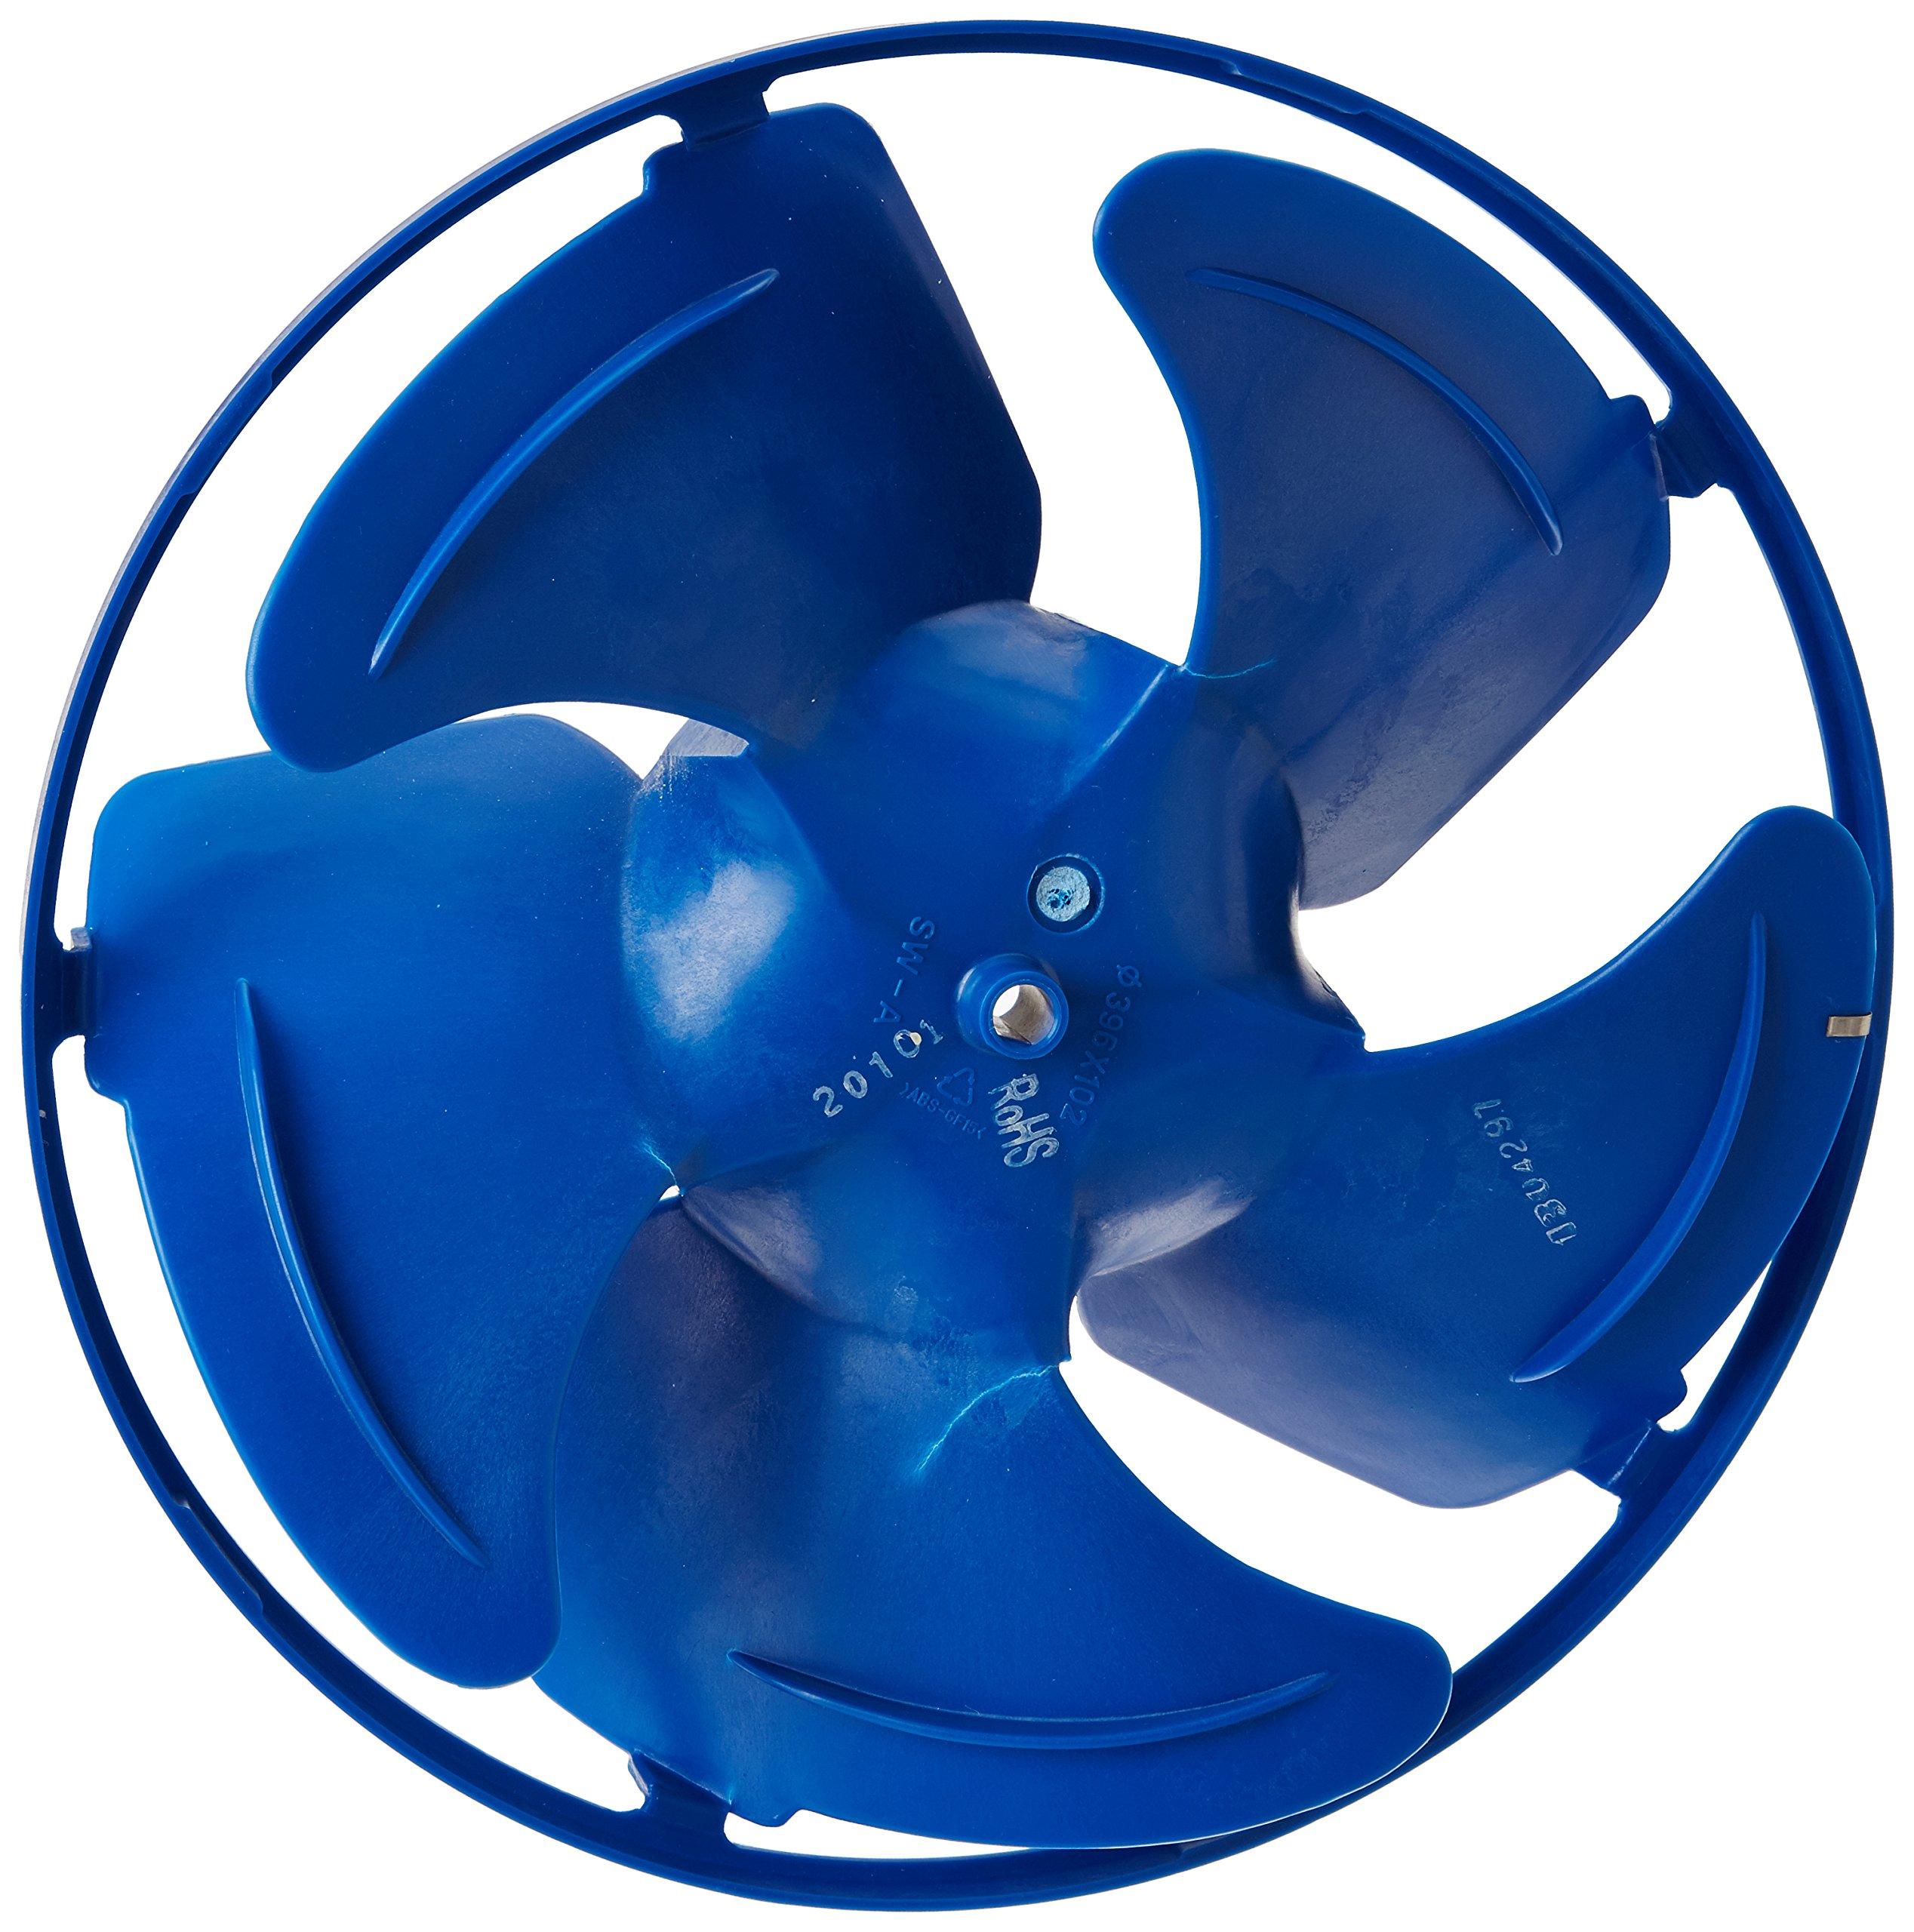 Frigidaire 5304472356 Fan Blade Air Conditioner by Frigidaire